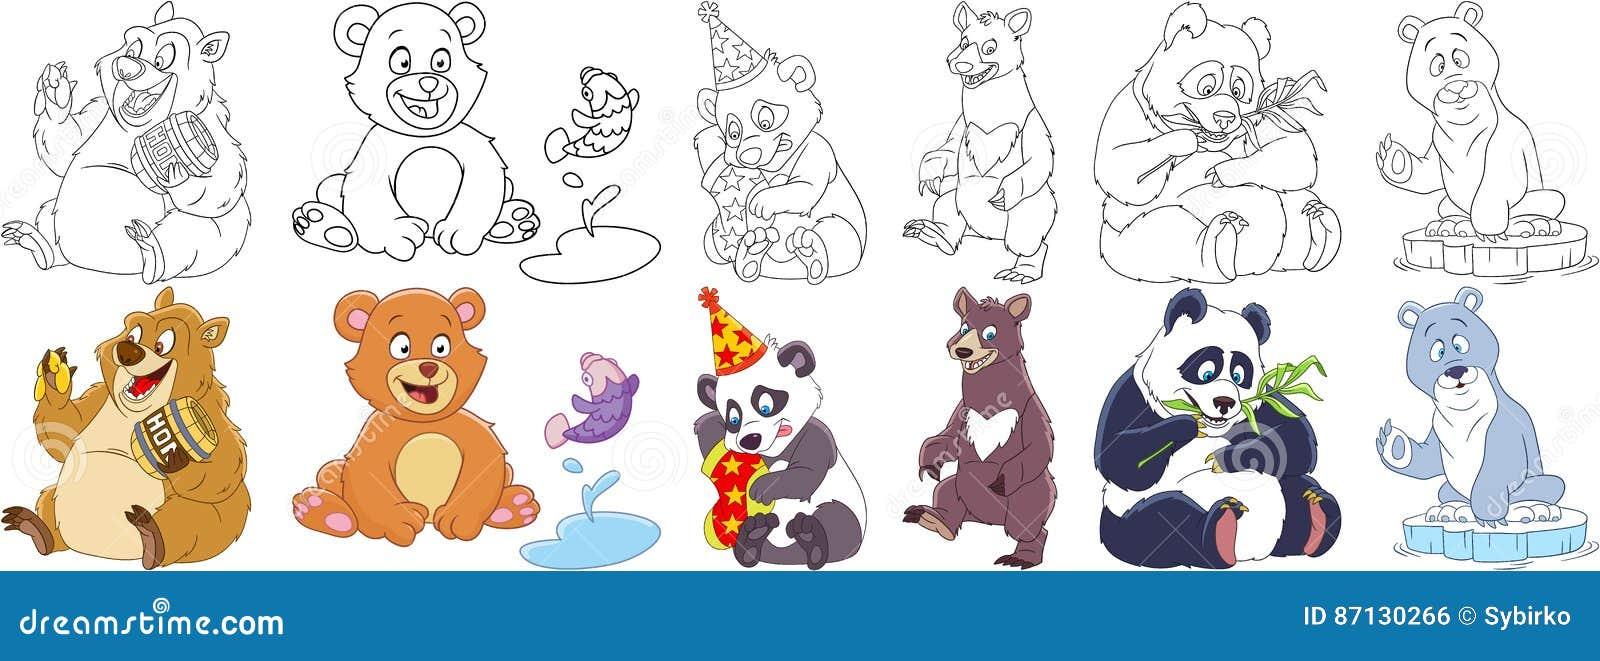 cartoon bear panda set animal childish collection bears pandas different emotions coloring book pages kids